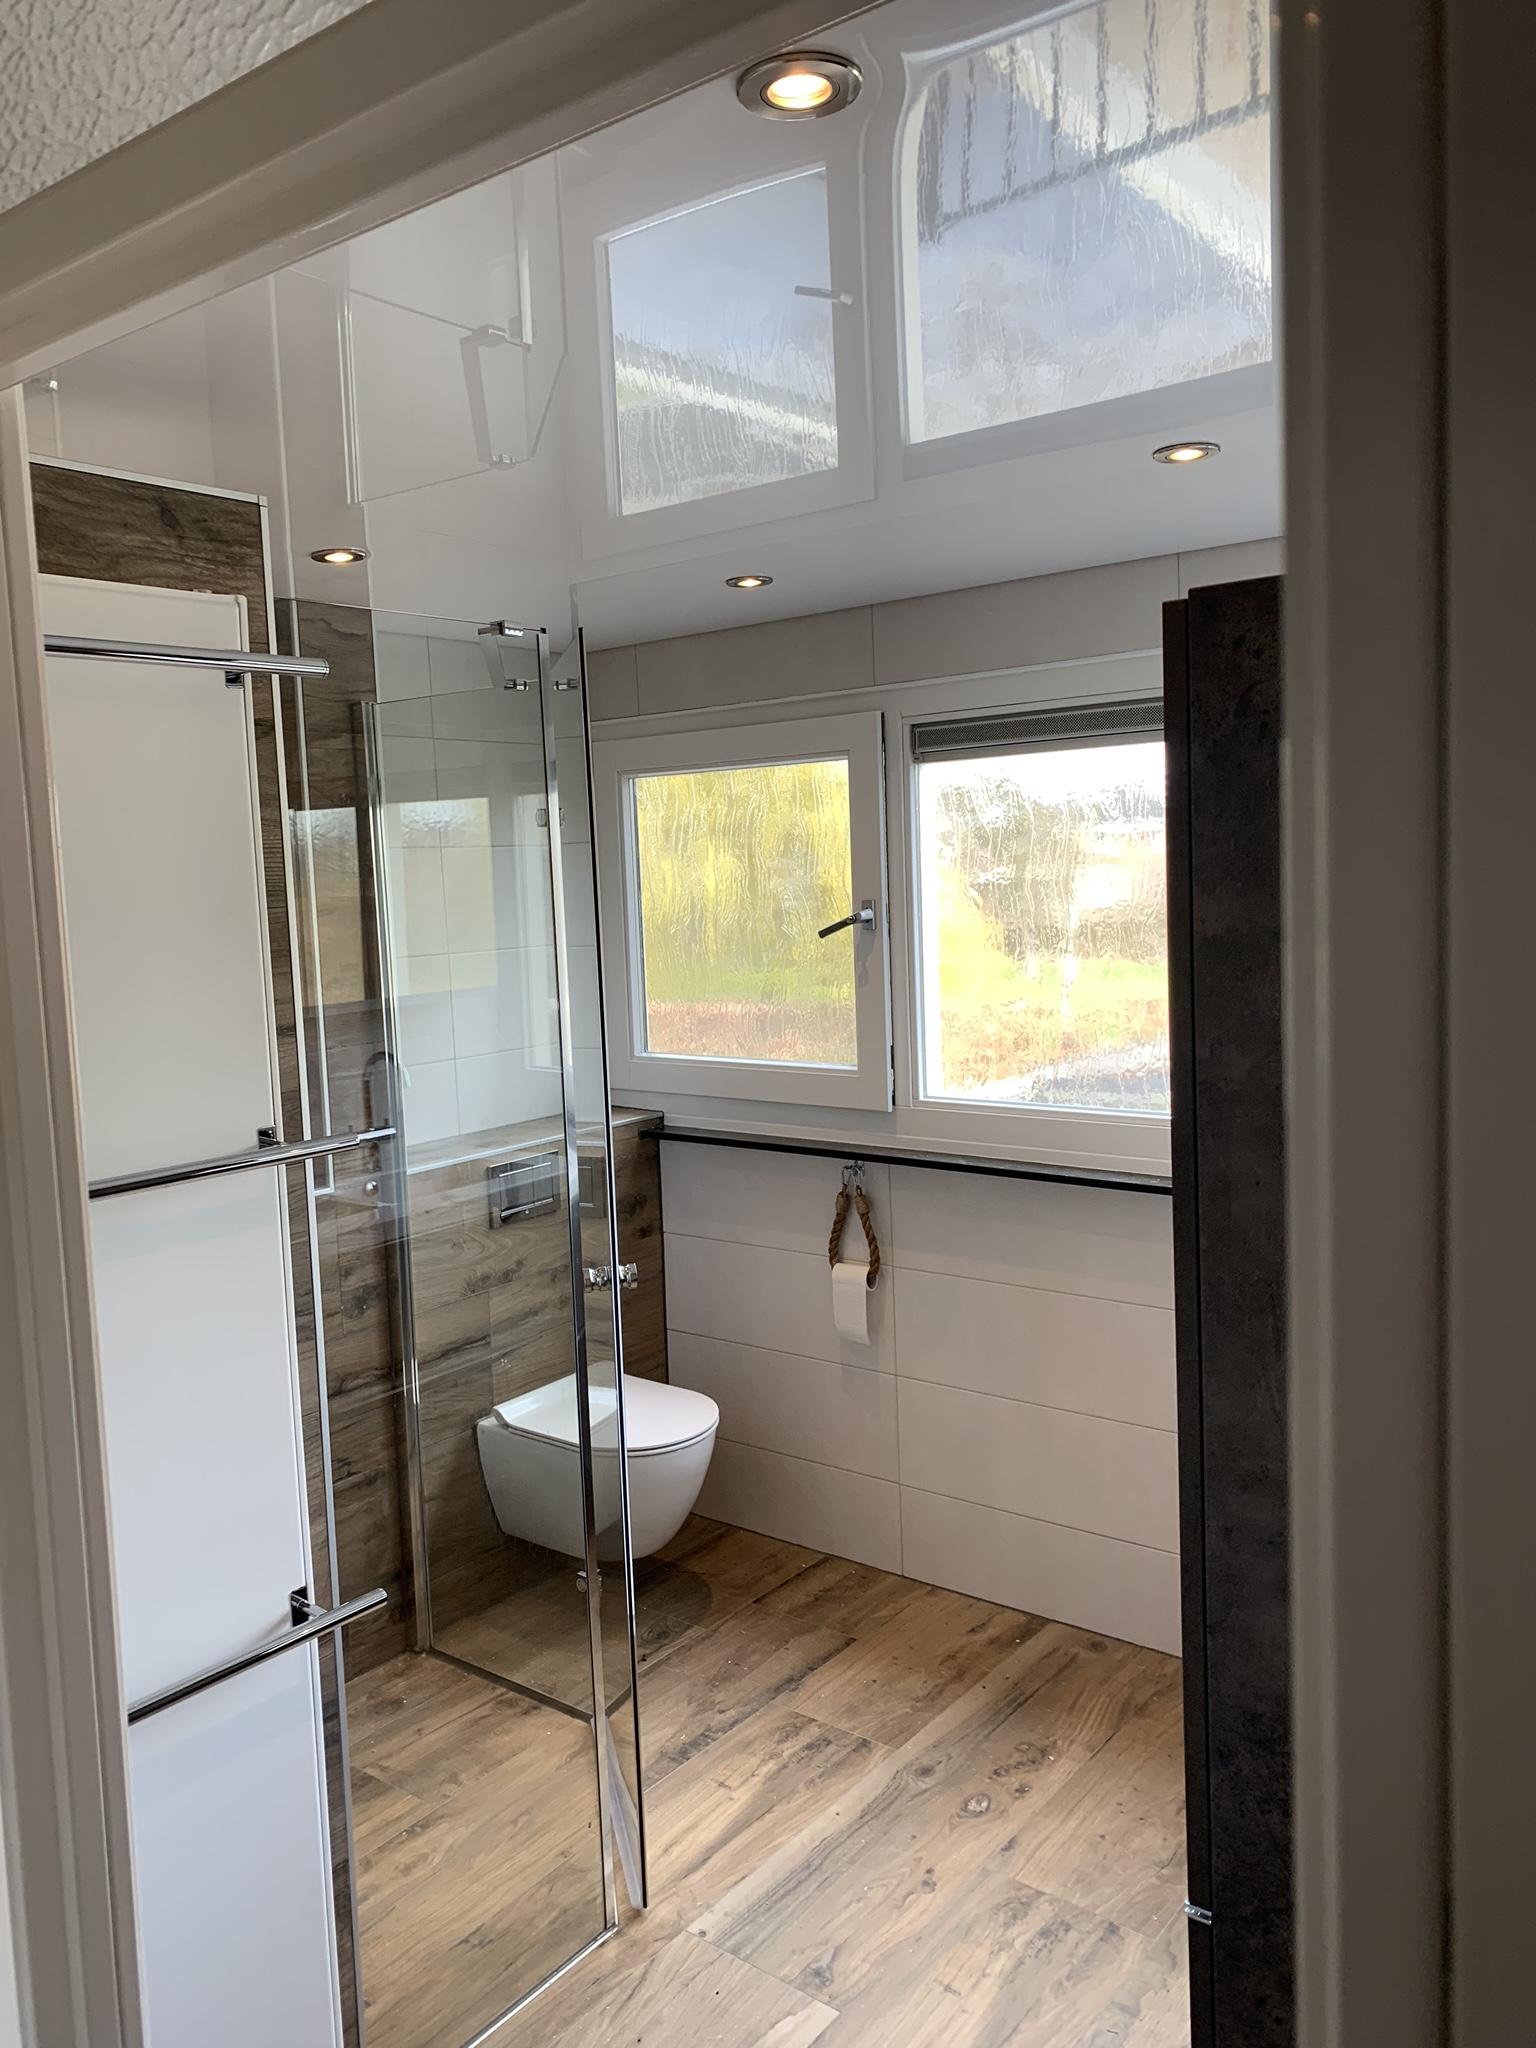 hoogglans plafond wit in badkamer